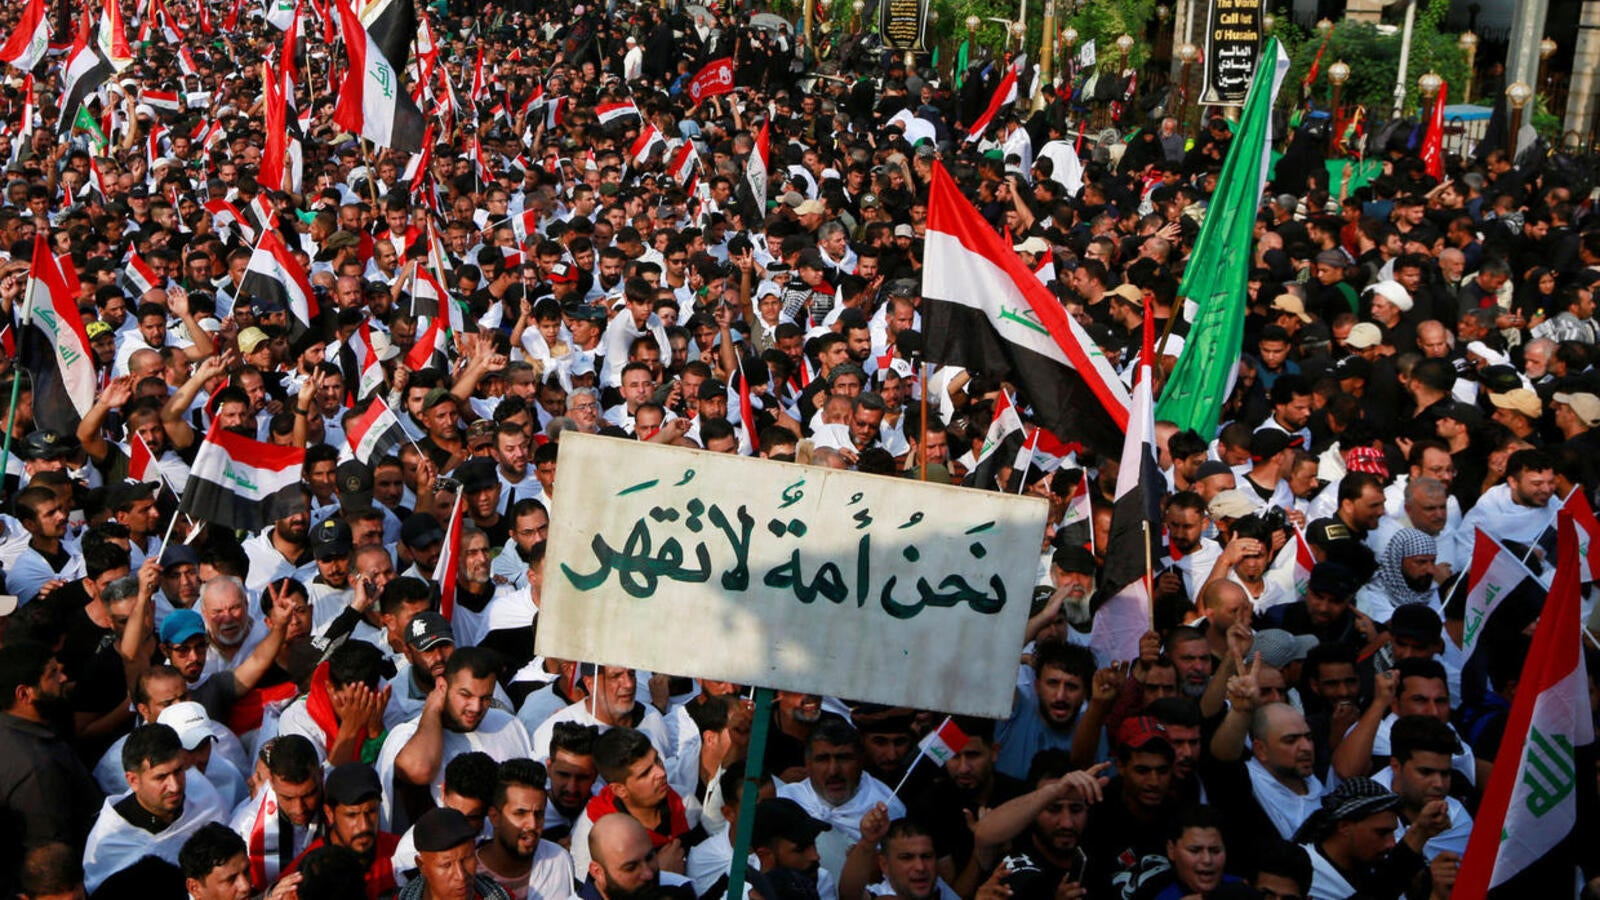 You are currently viewing الاحتجاجات في العراق: احباط شعبي متزايد وعنف حكومي غير مبرر مع إجراءات إصلاحية غير موثوقة